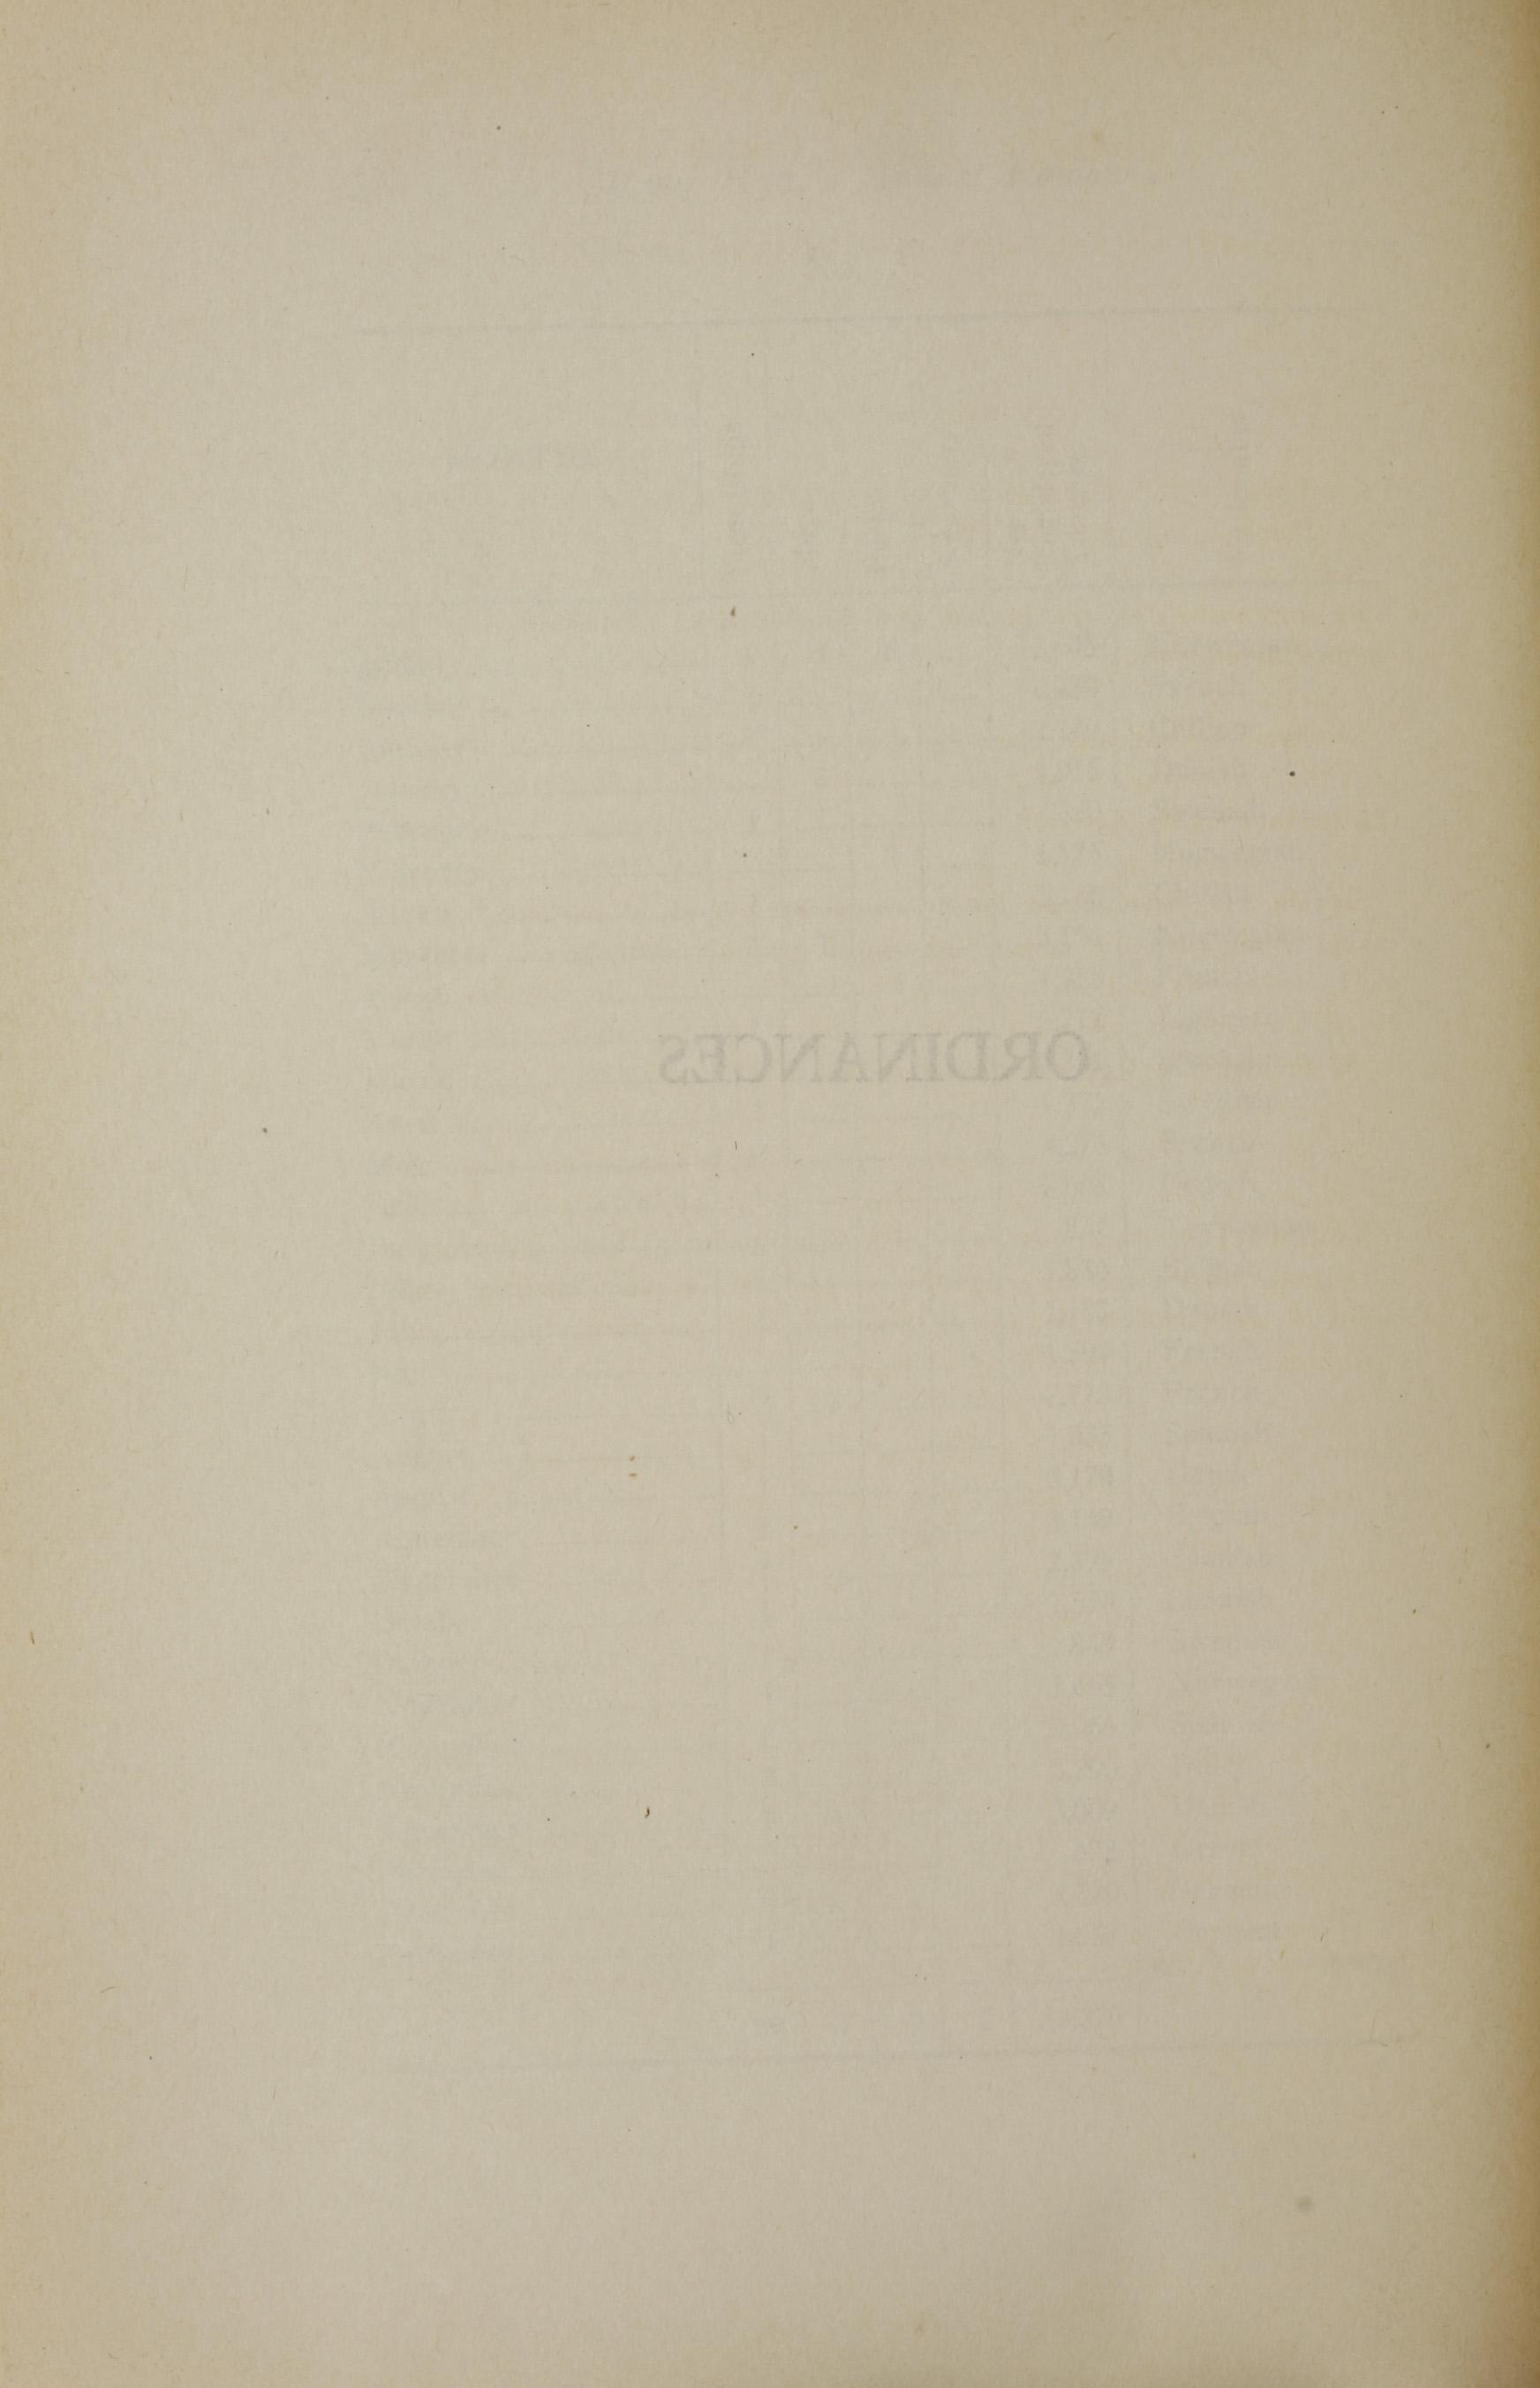 Charleston Yearbook, 1919, page 586